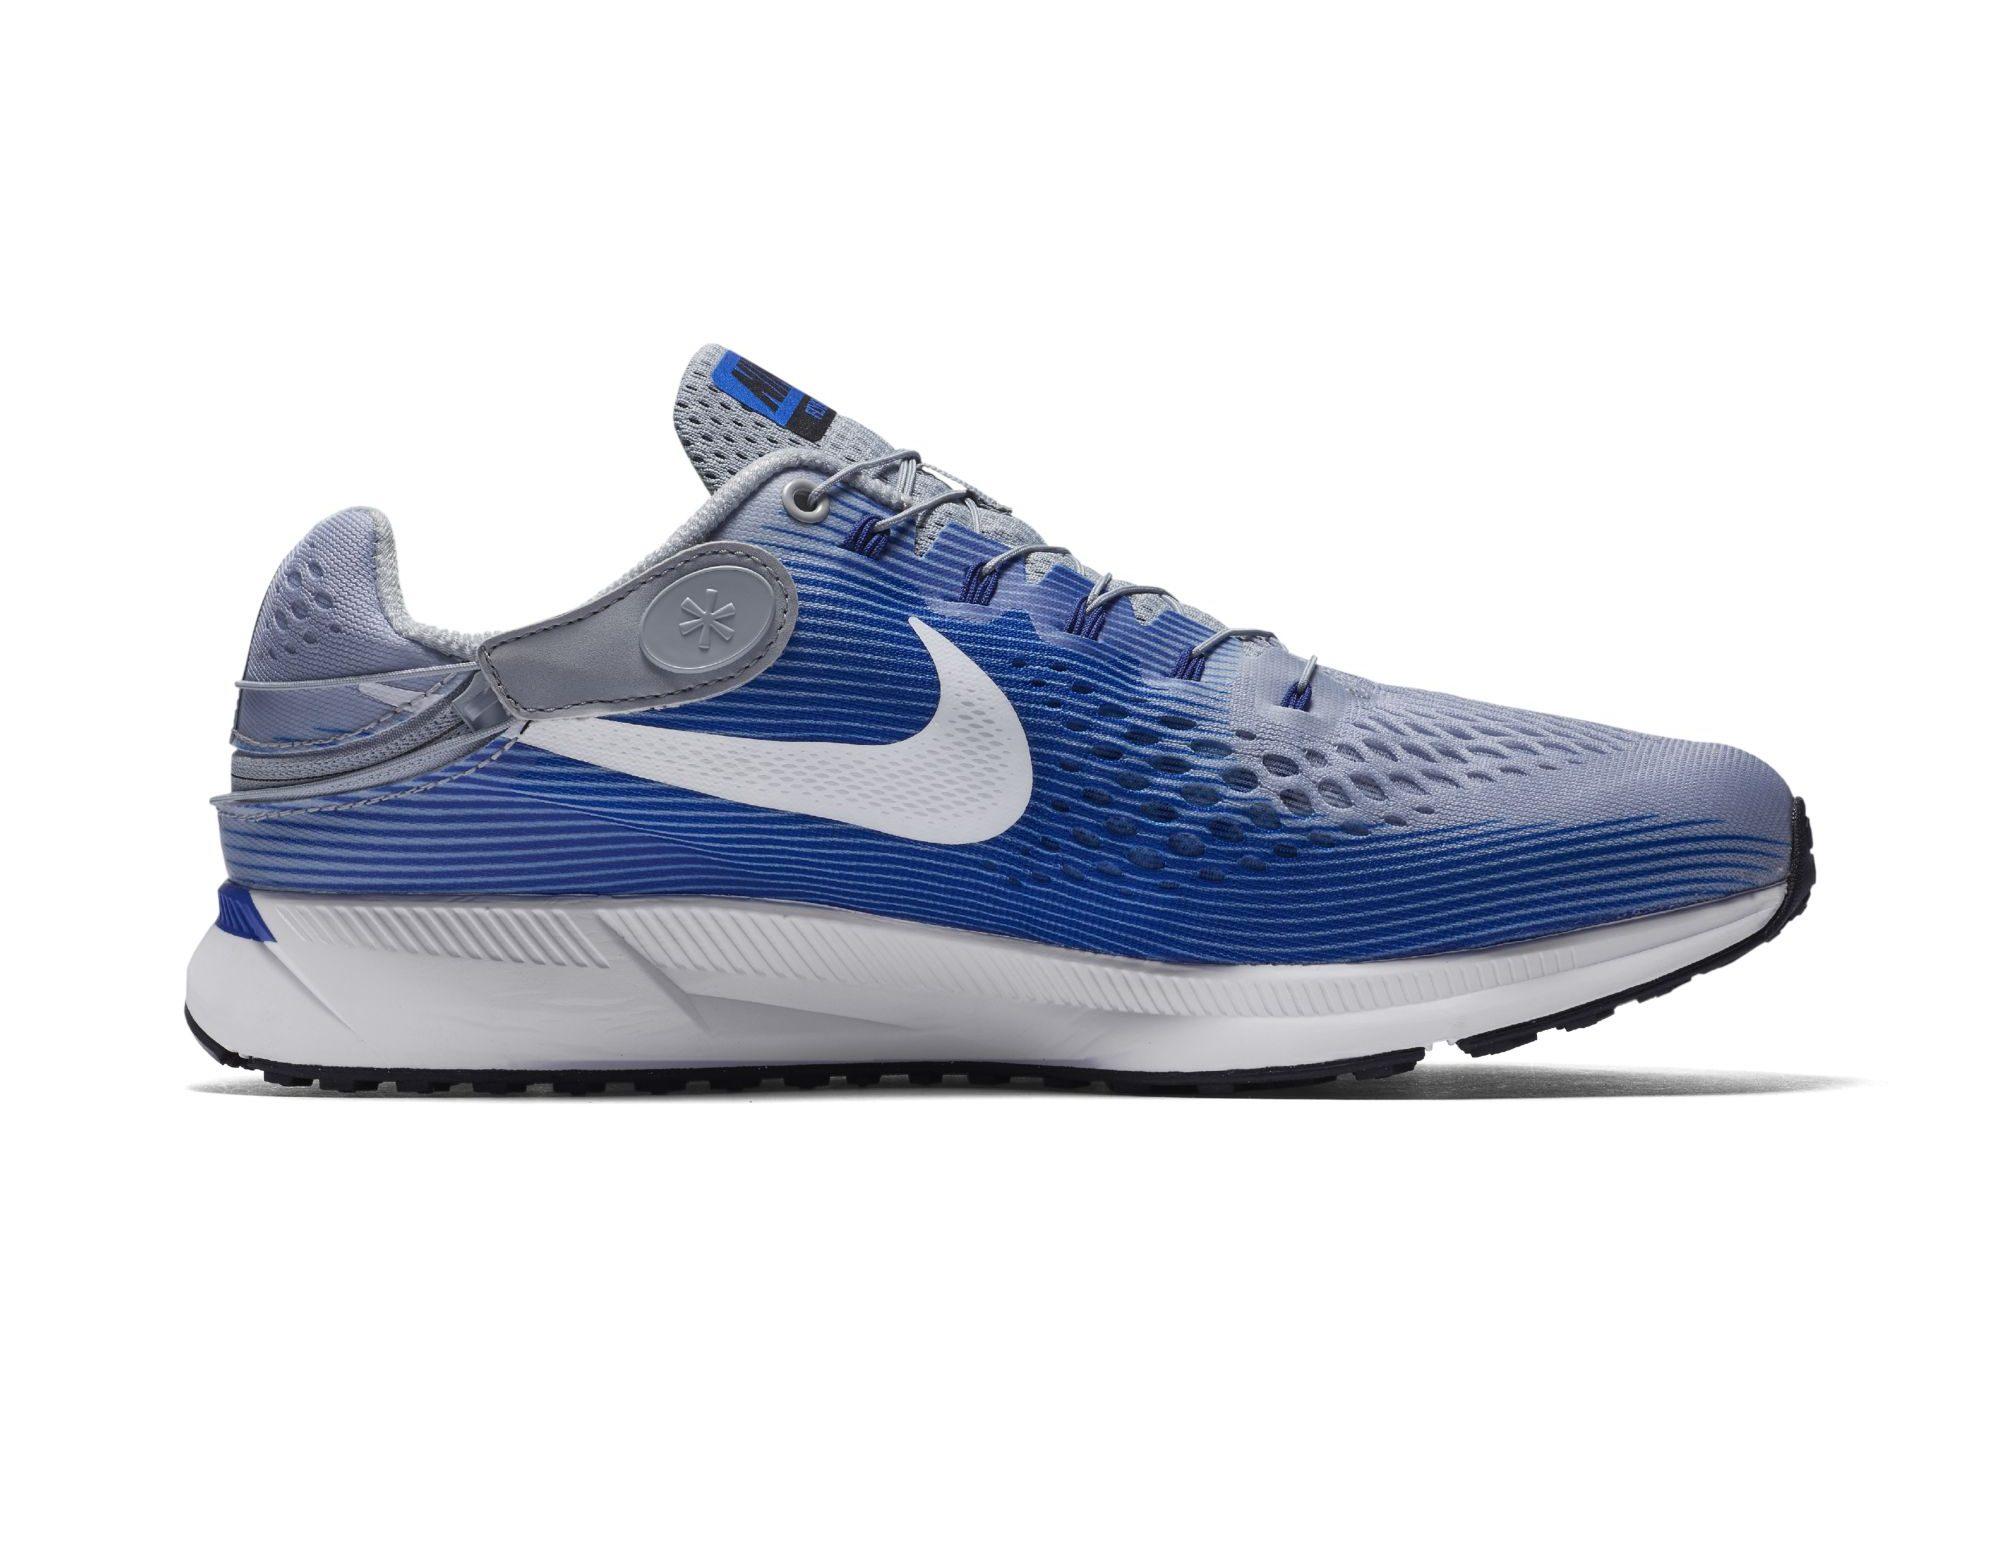 sports shoes 30e74 112f8 Nike Air Zoom Pegasus 34 Flyease 3. Nov12